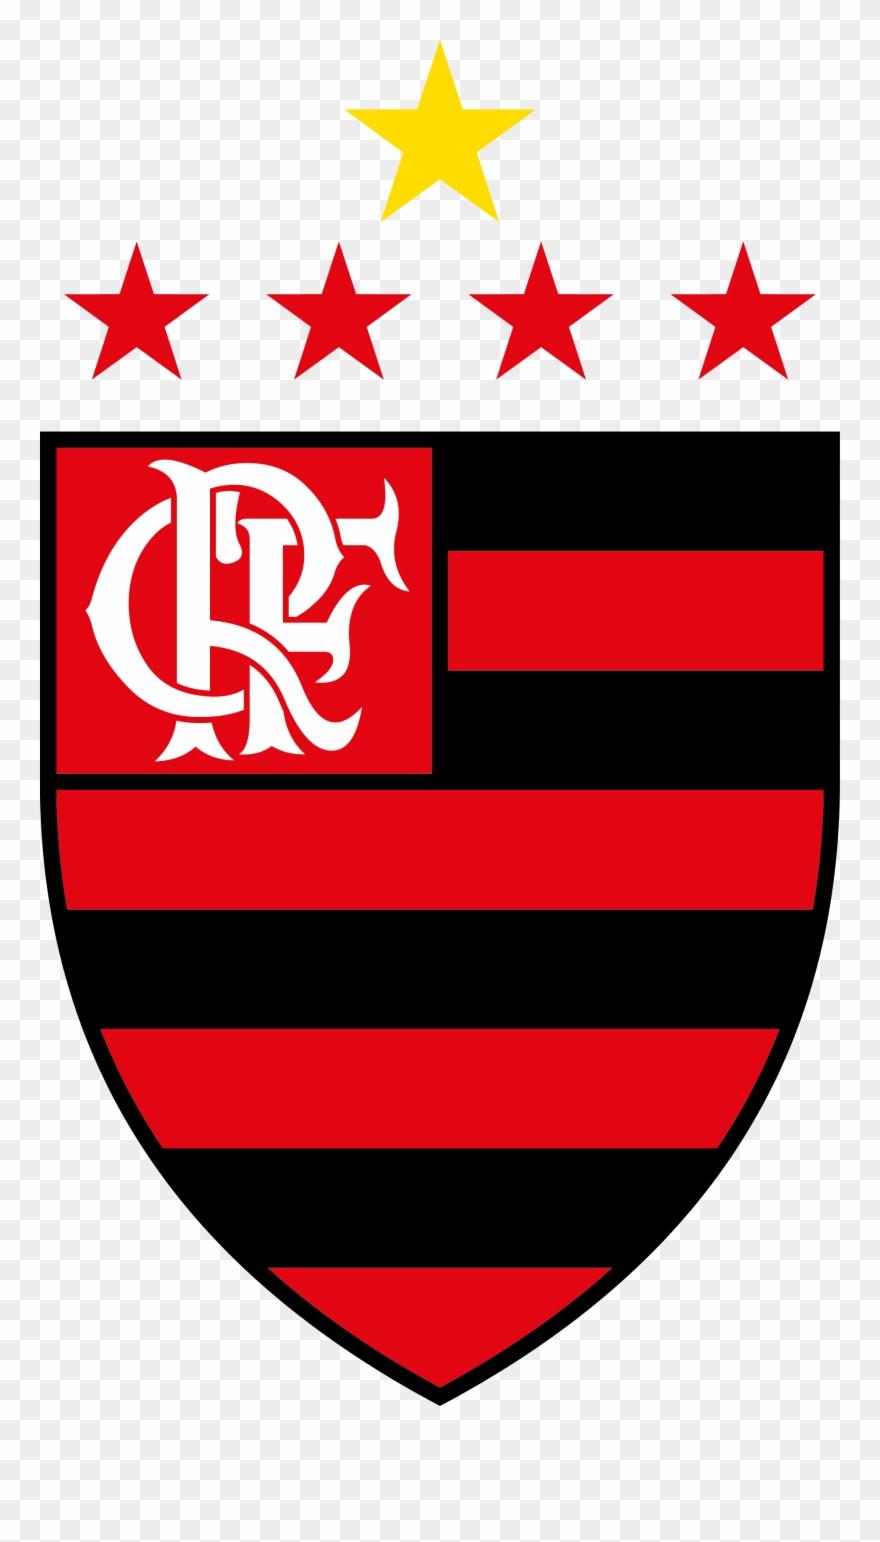 Logo flamengo clipart royalty free stock Flamengo Clipart (#2758461) - PinClipart royalty free stock